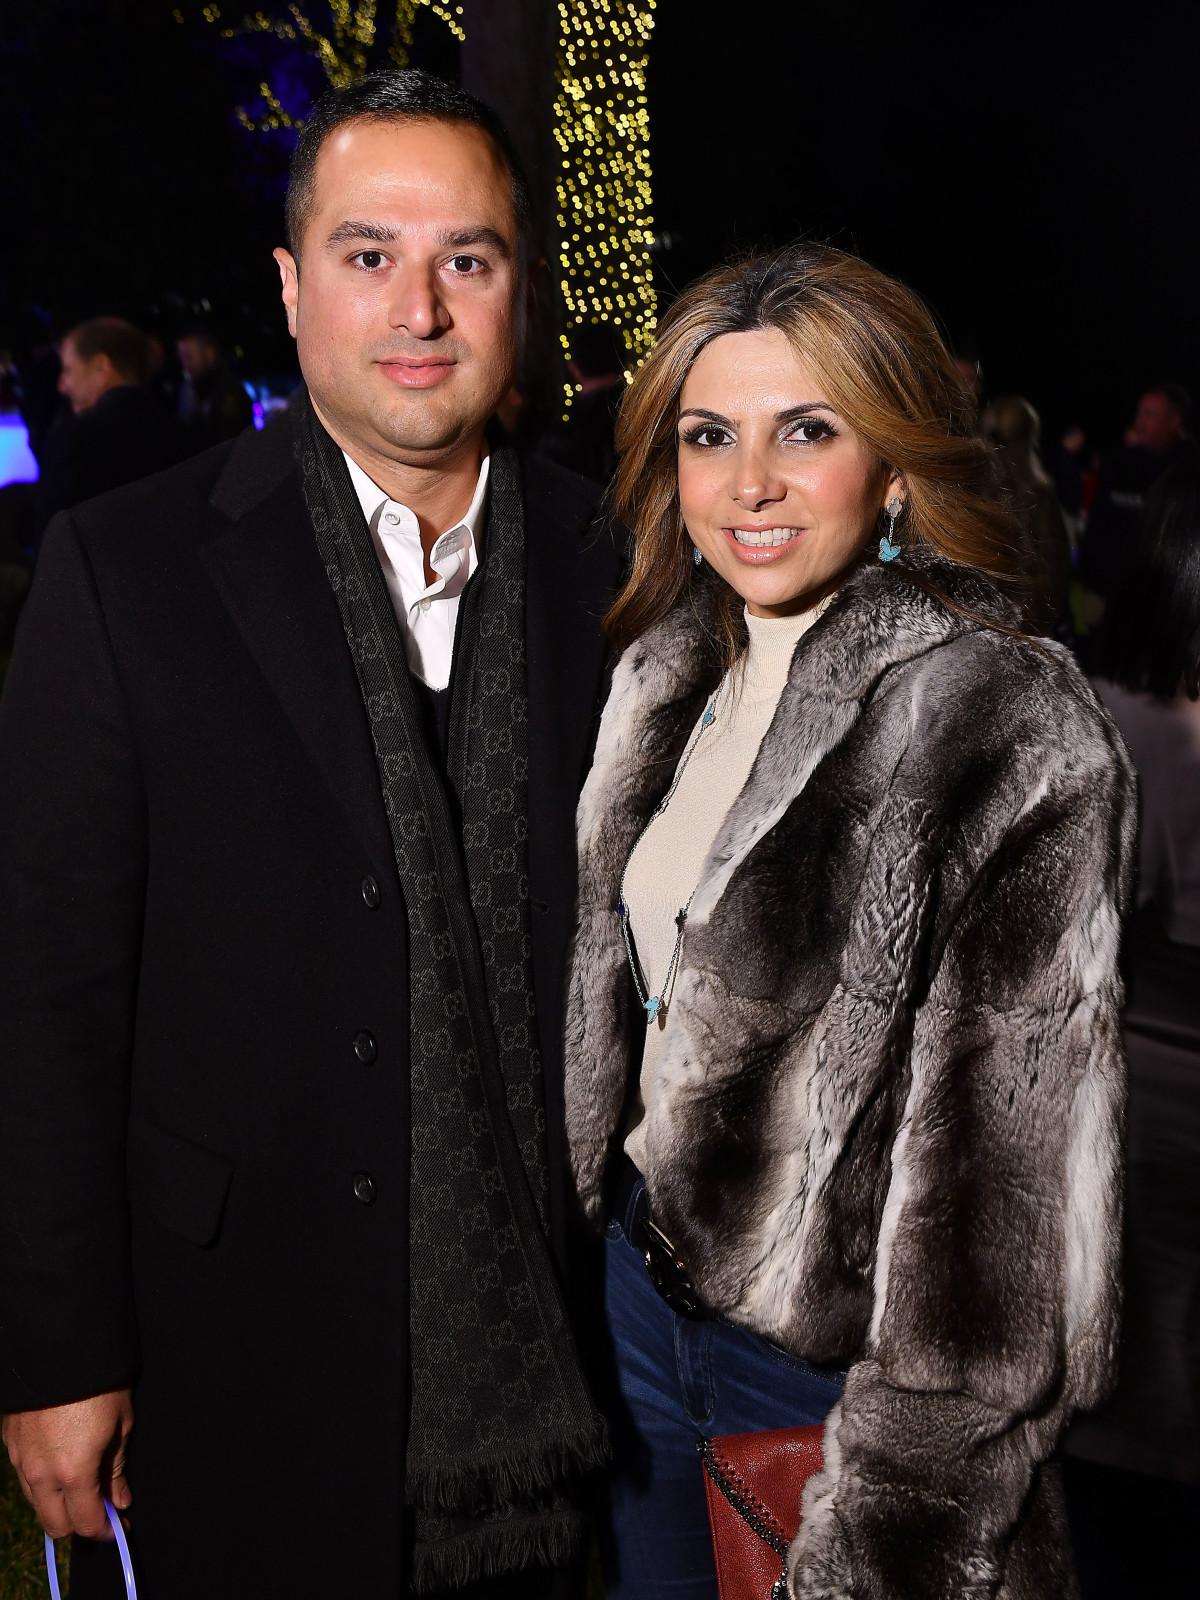 True Blue Gala 2019  Alan and Anooshea Taghdisi